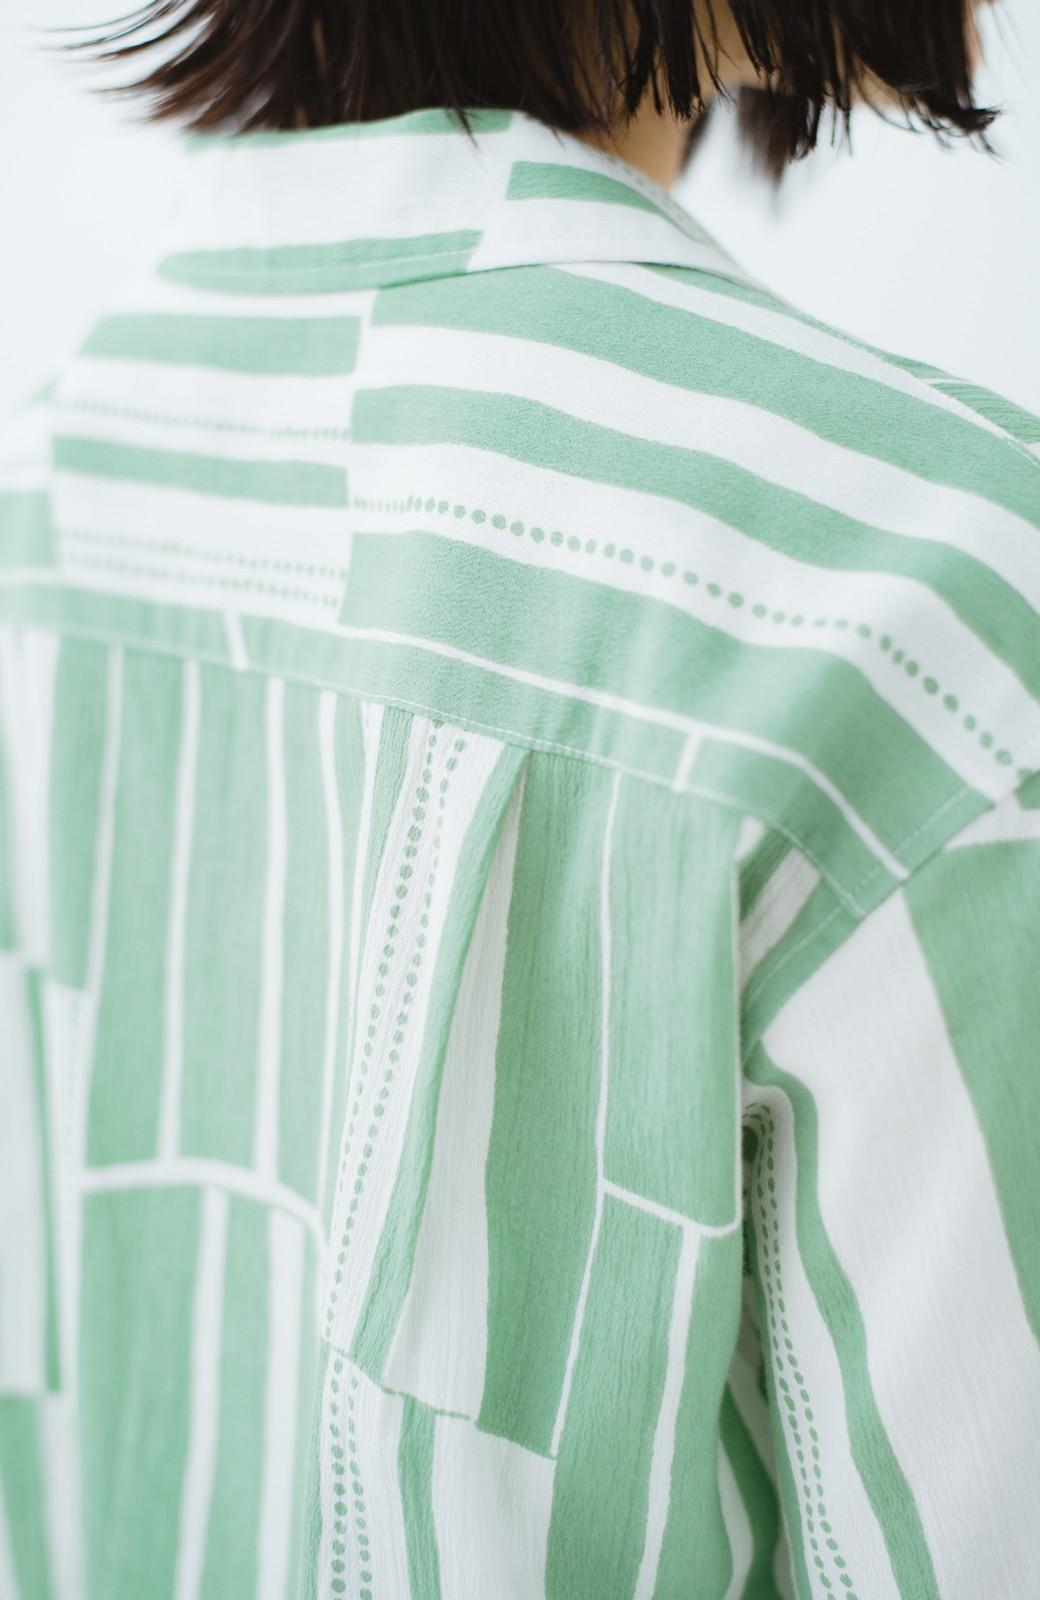 haco! 京都の浴衣屋さんと作った浴衣生地のシャツワンピース <グリーン系その他>の商品写真10